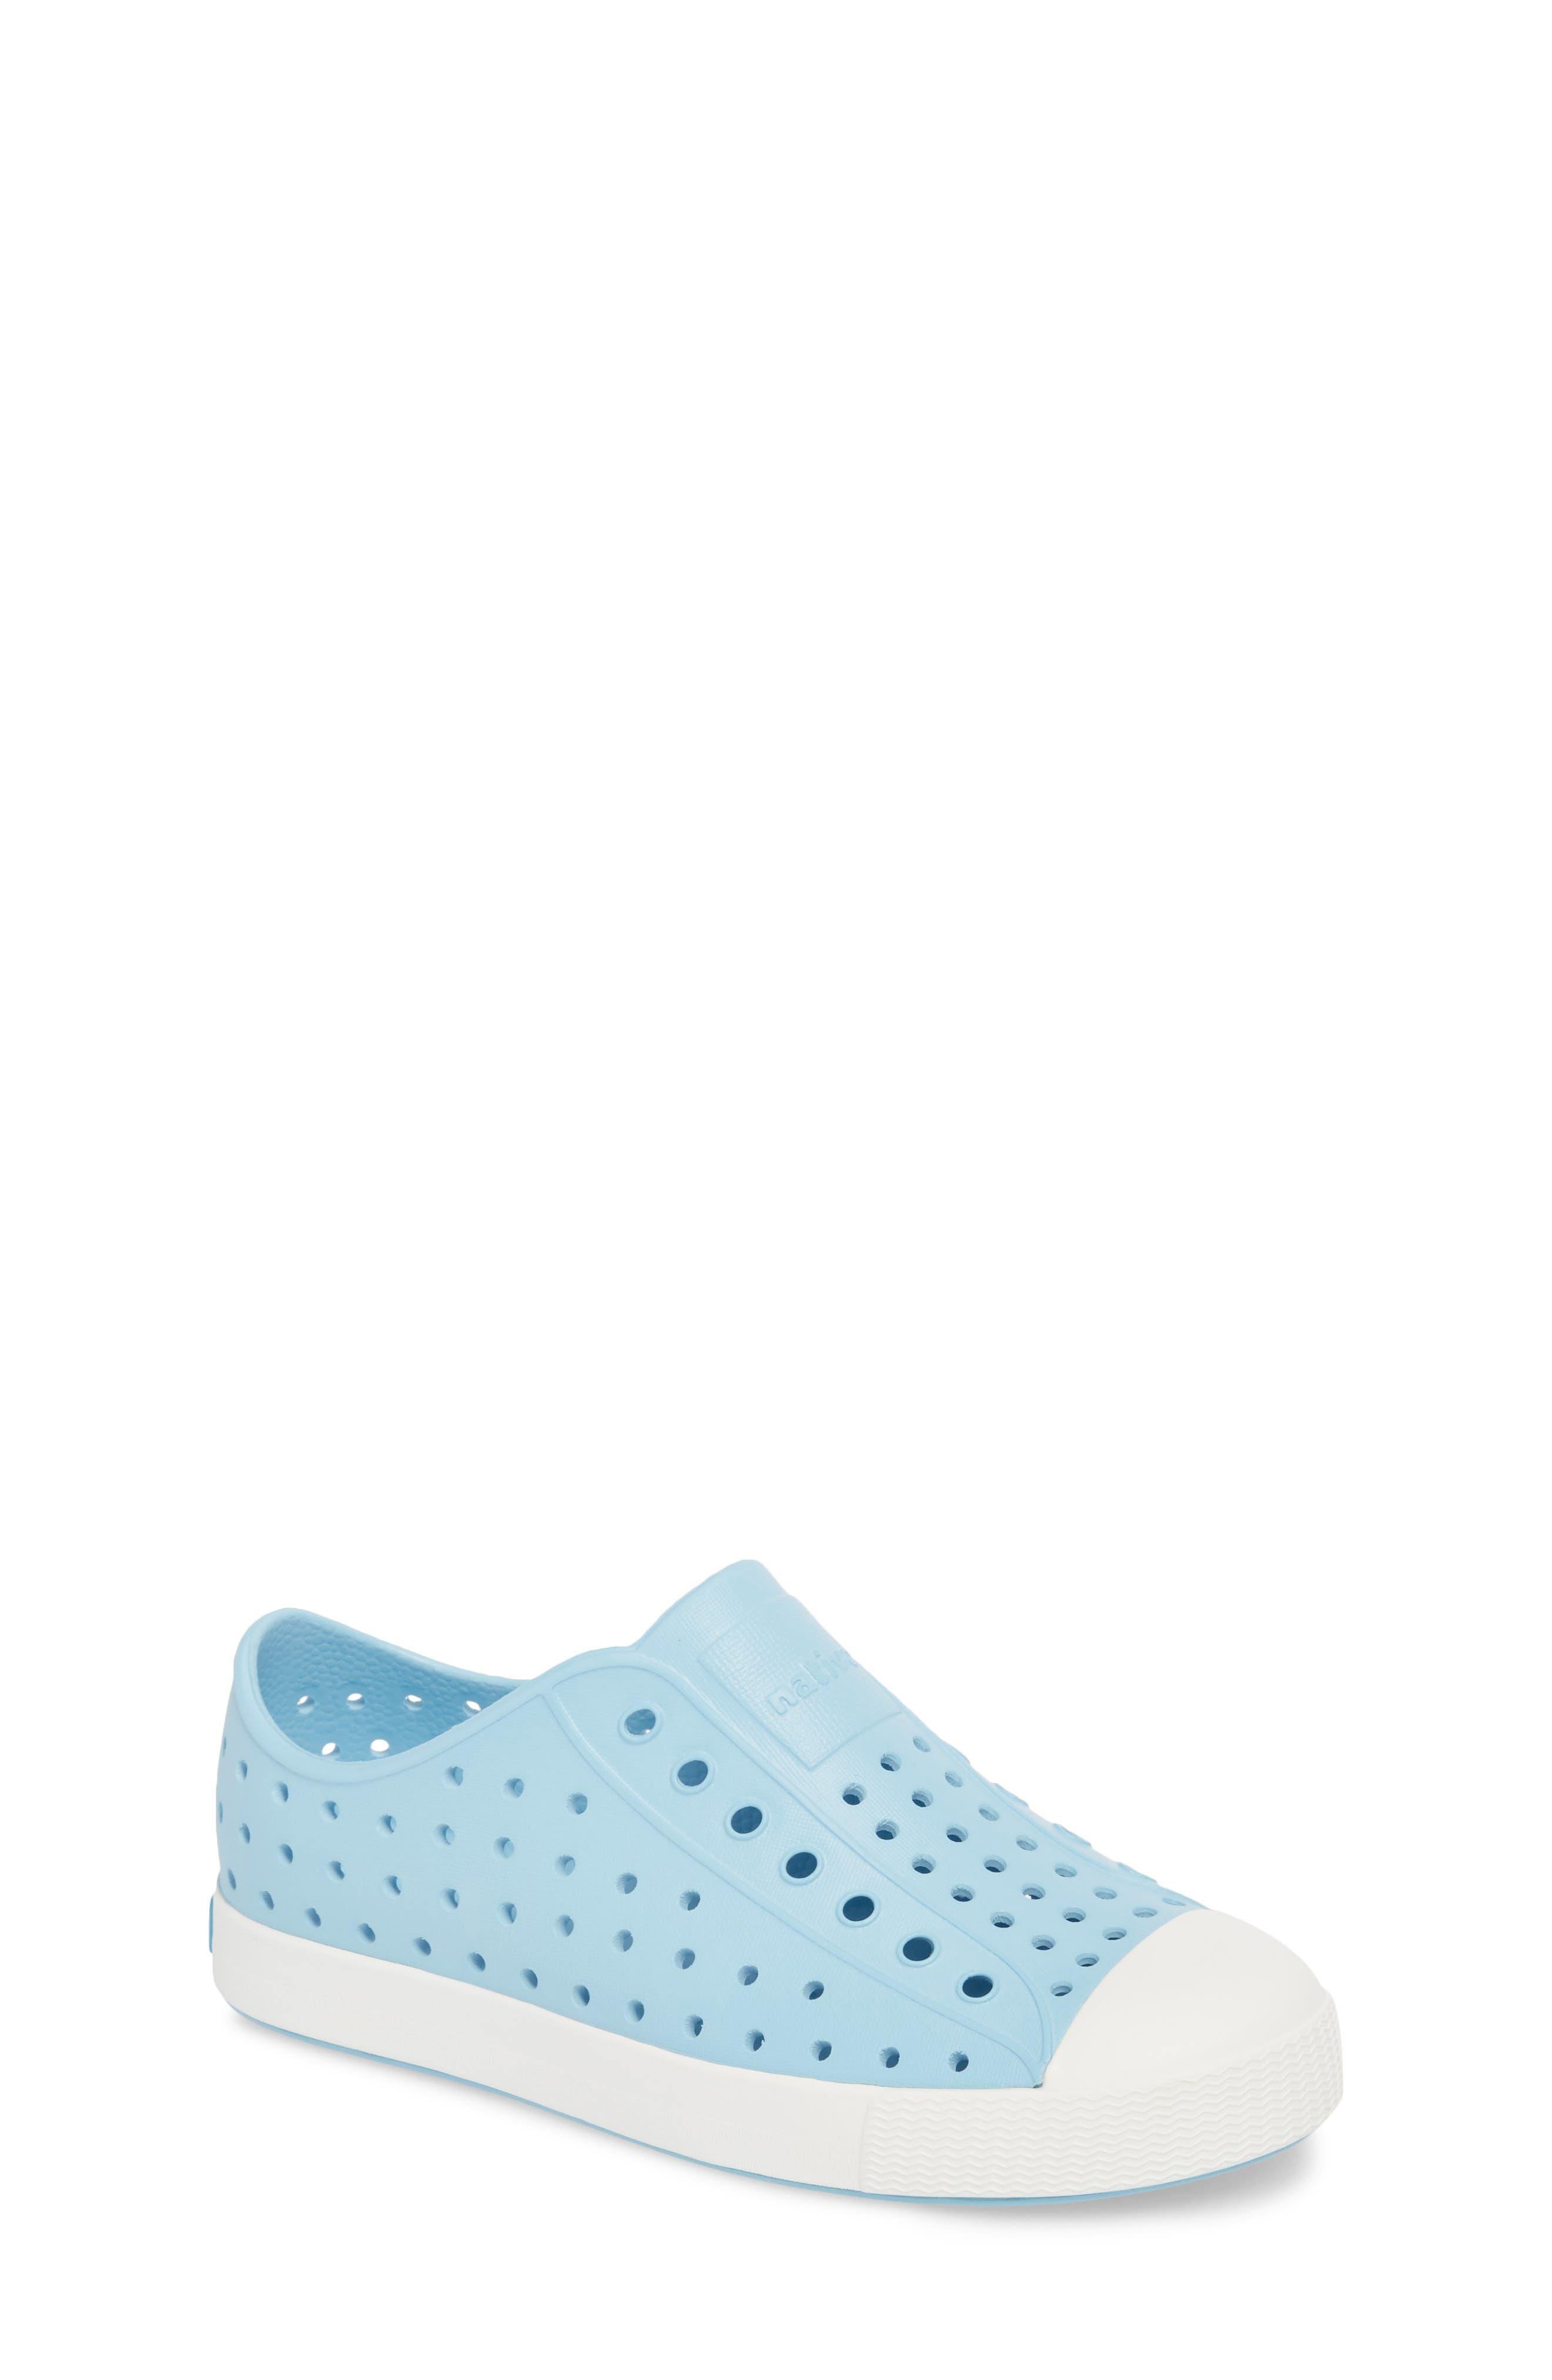 'Jefferson' Water Friendly Slip-On Sneaker,                             Main thumbnail 20, color,